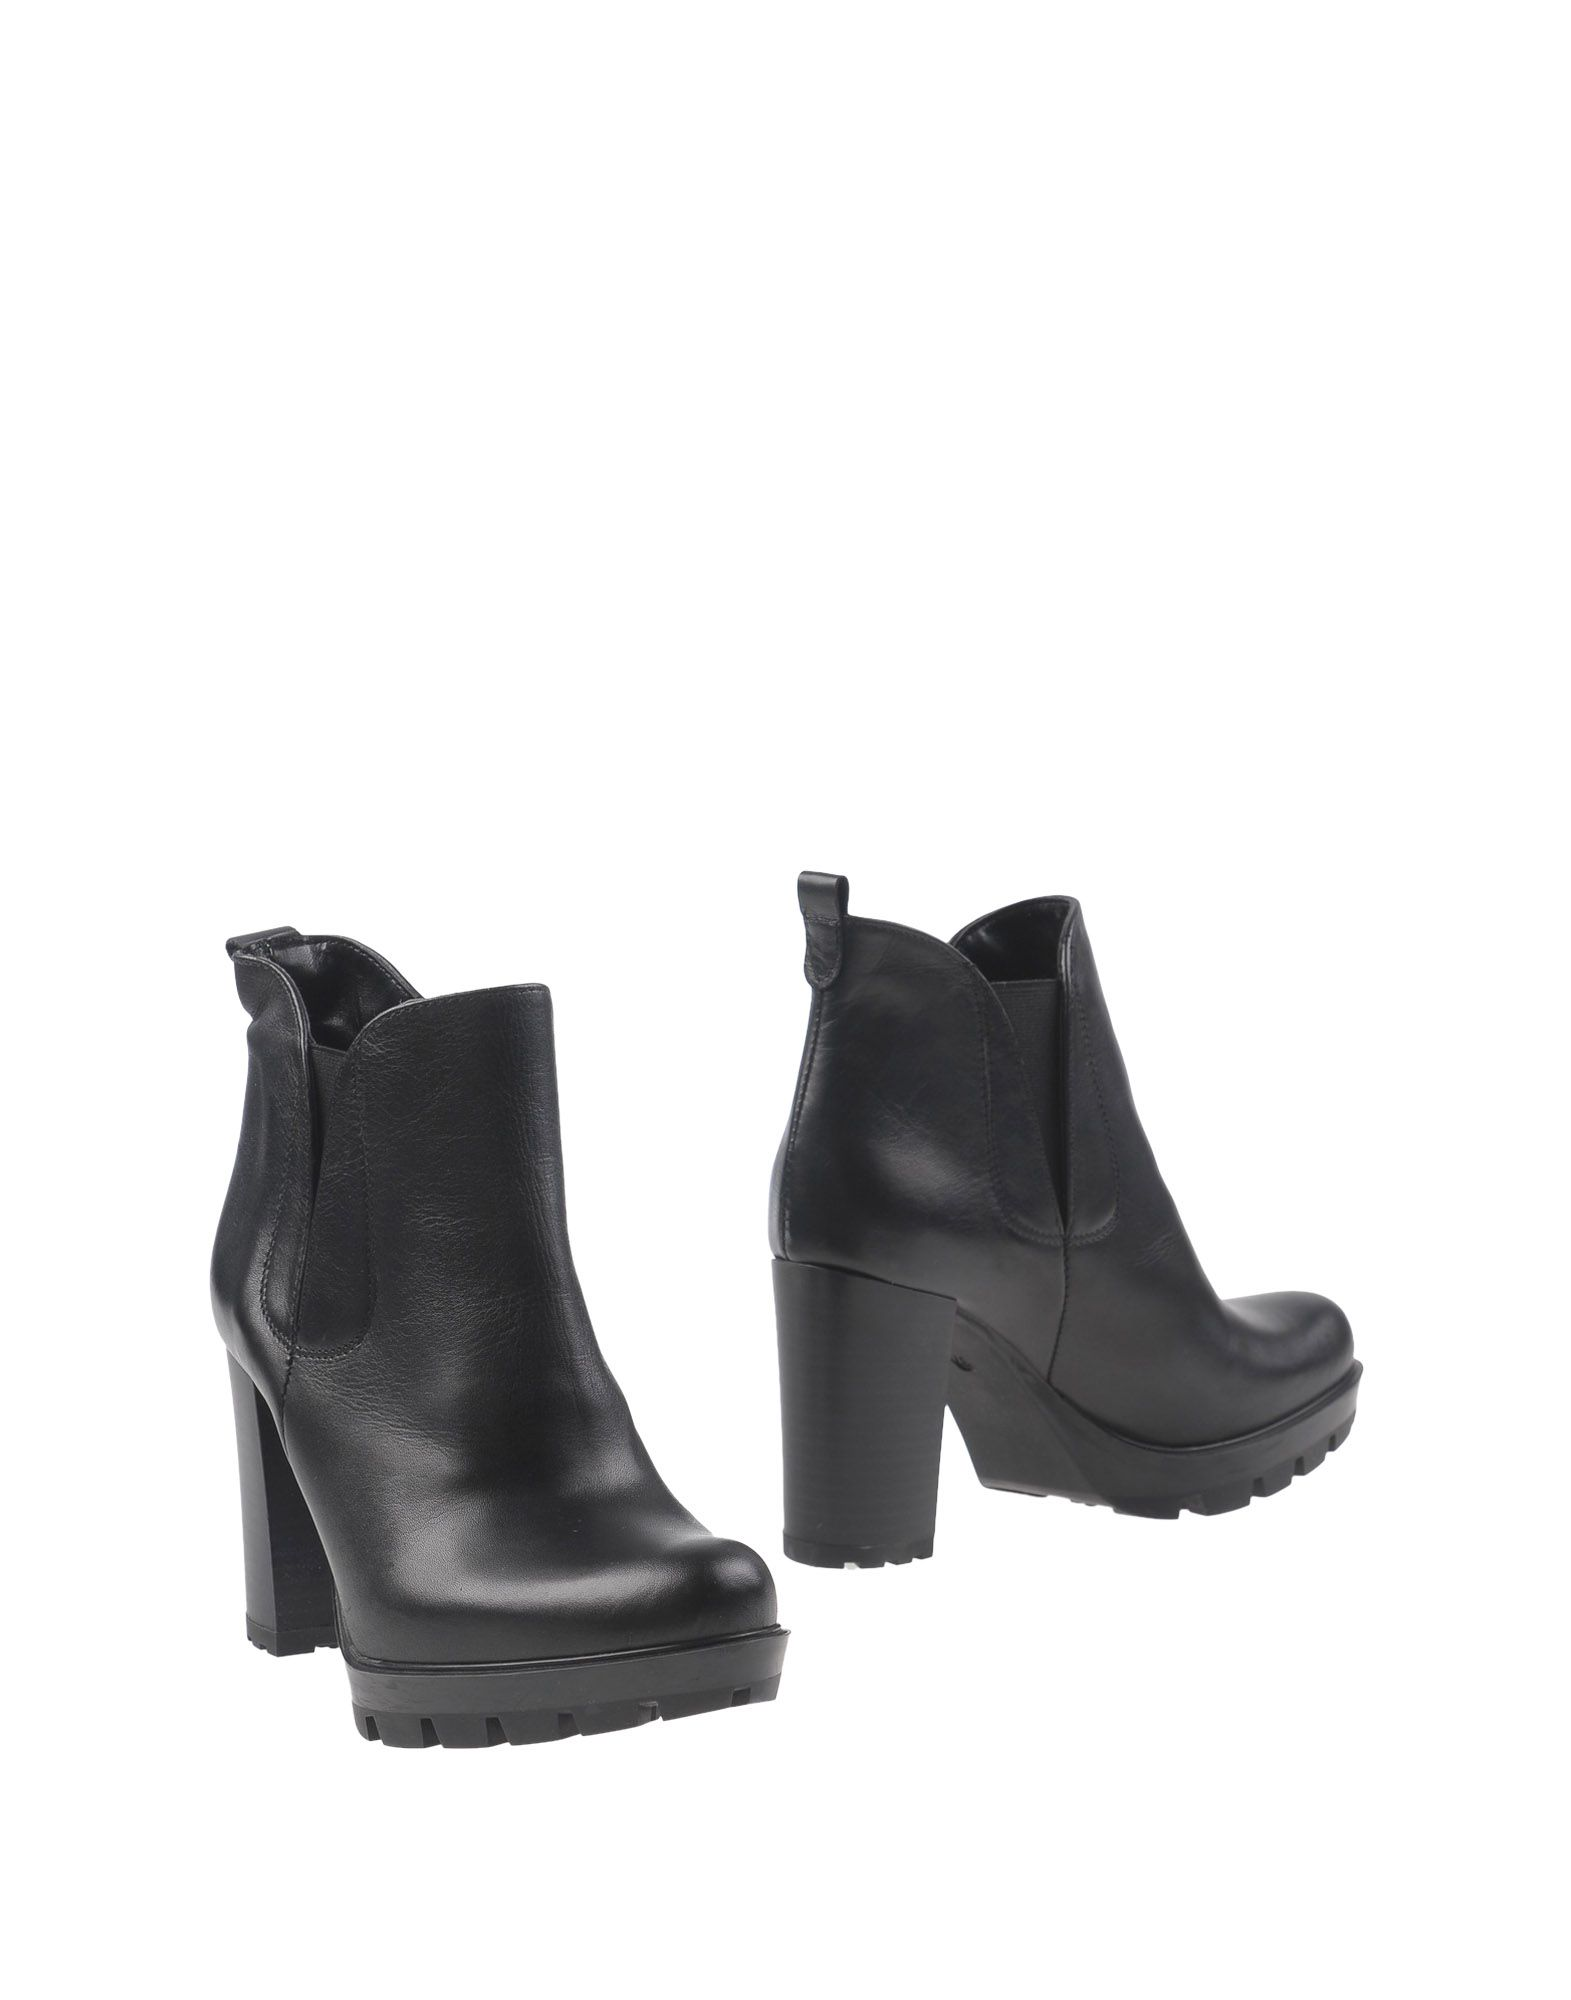 BRAWN'S Полусапоги и высокие ботинки magazzini del sale полусапоги и высокие ботинки